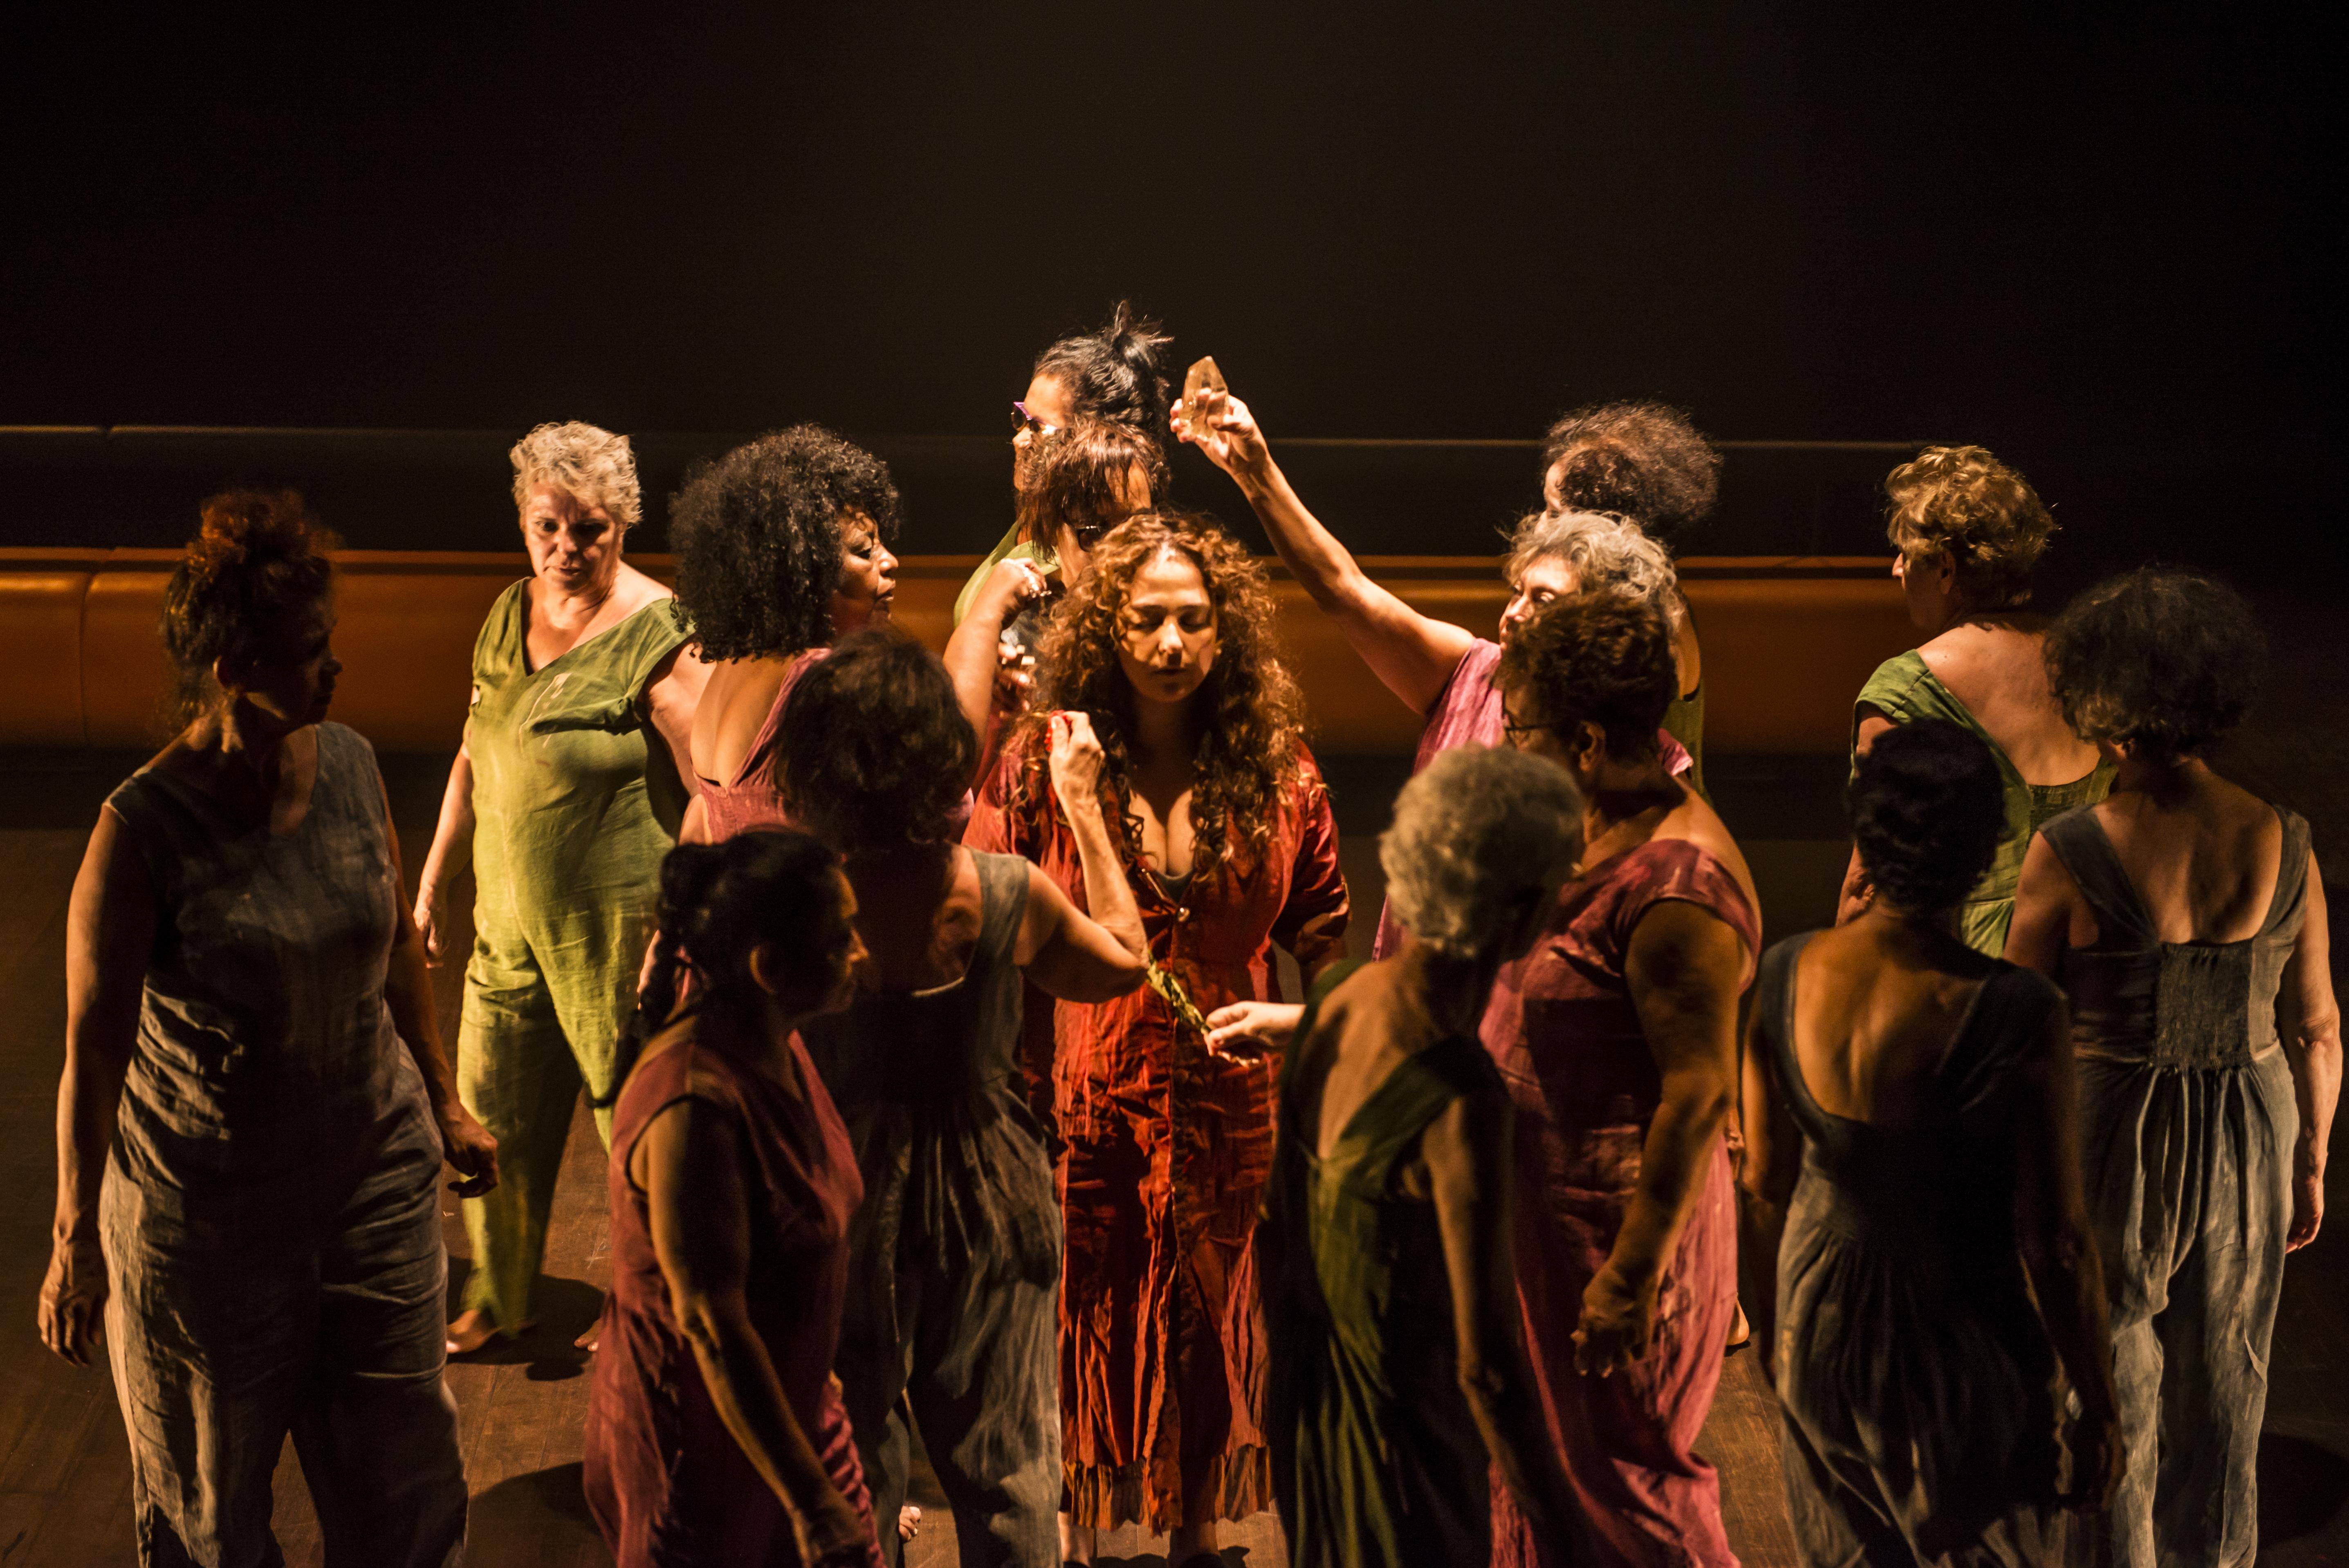 Grupo Meninas da Gamboa participa como um coro